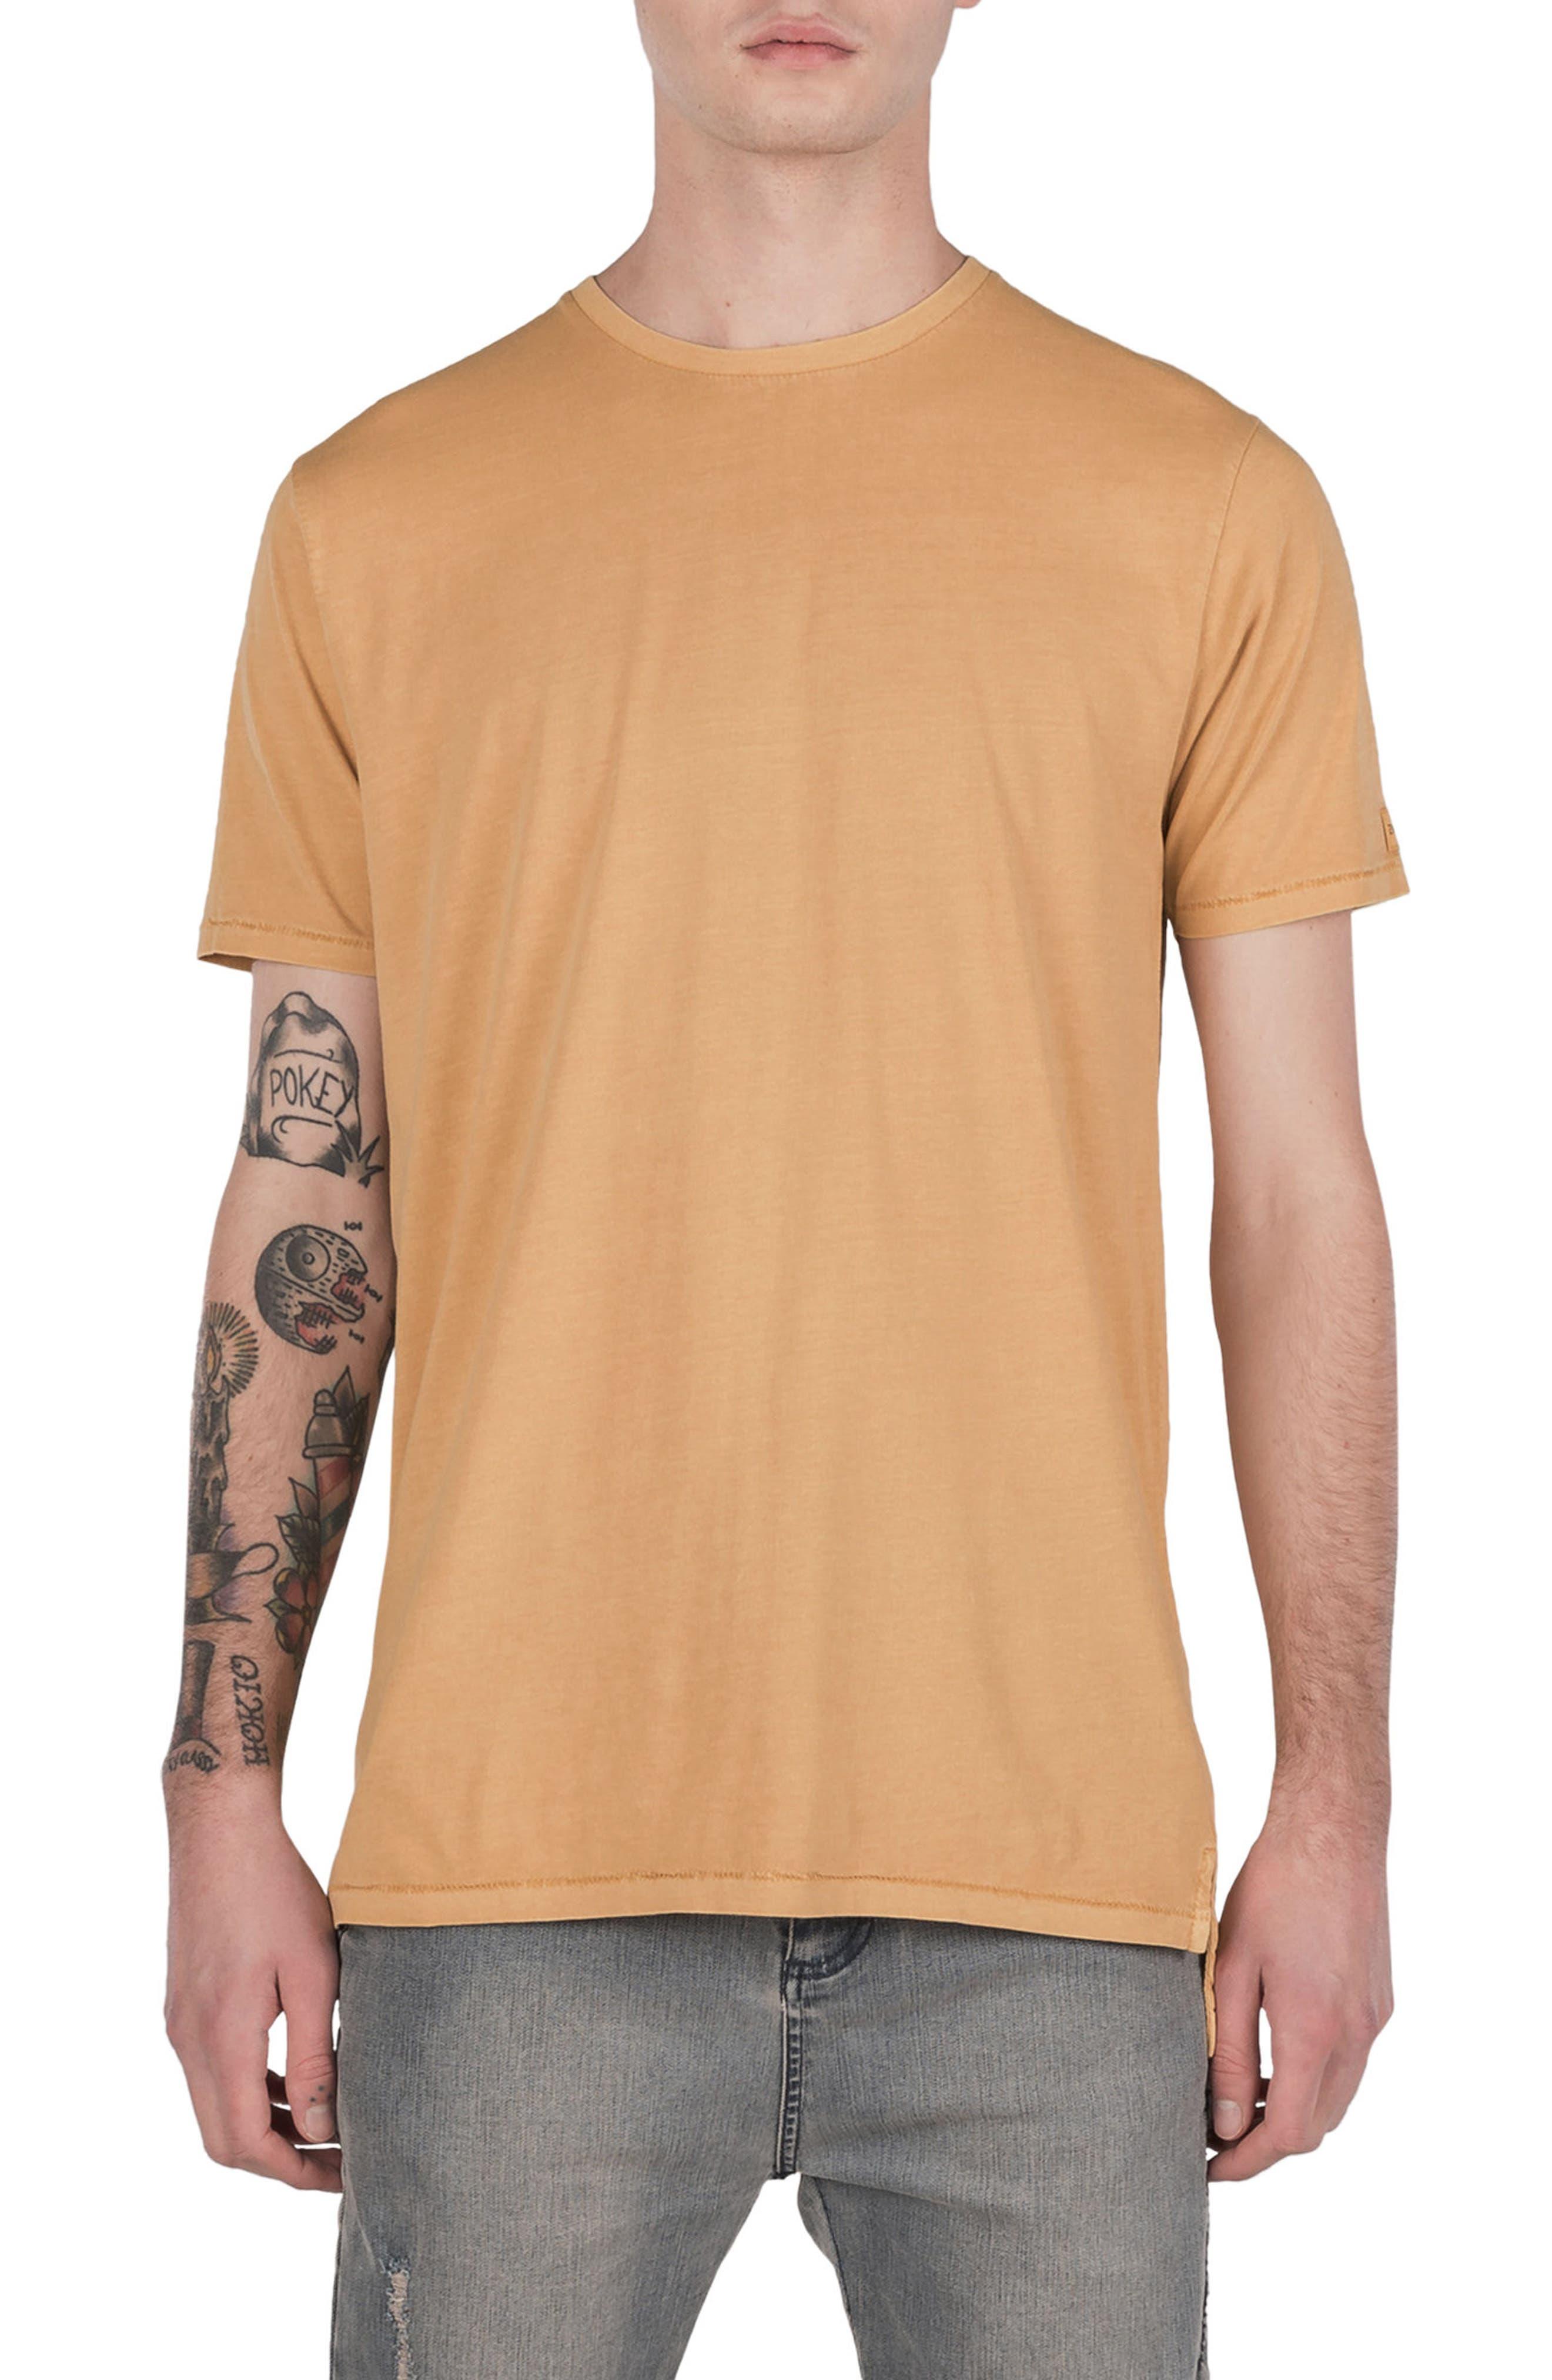 Flintlock T-Shirt,                             Main thumbnail 1, color,                             Saffron